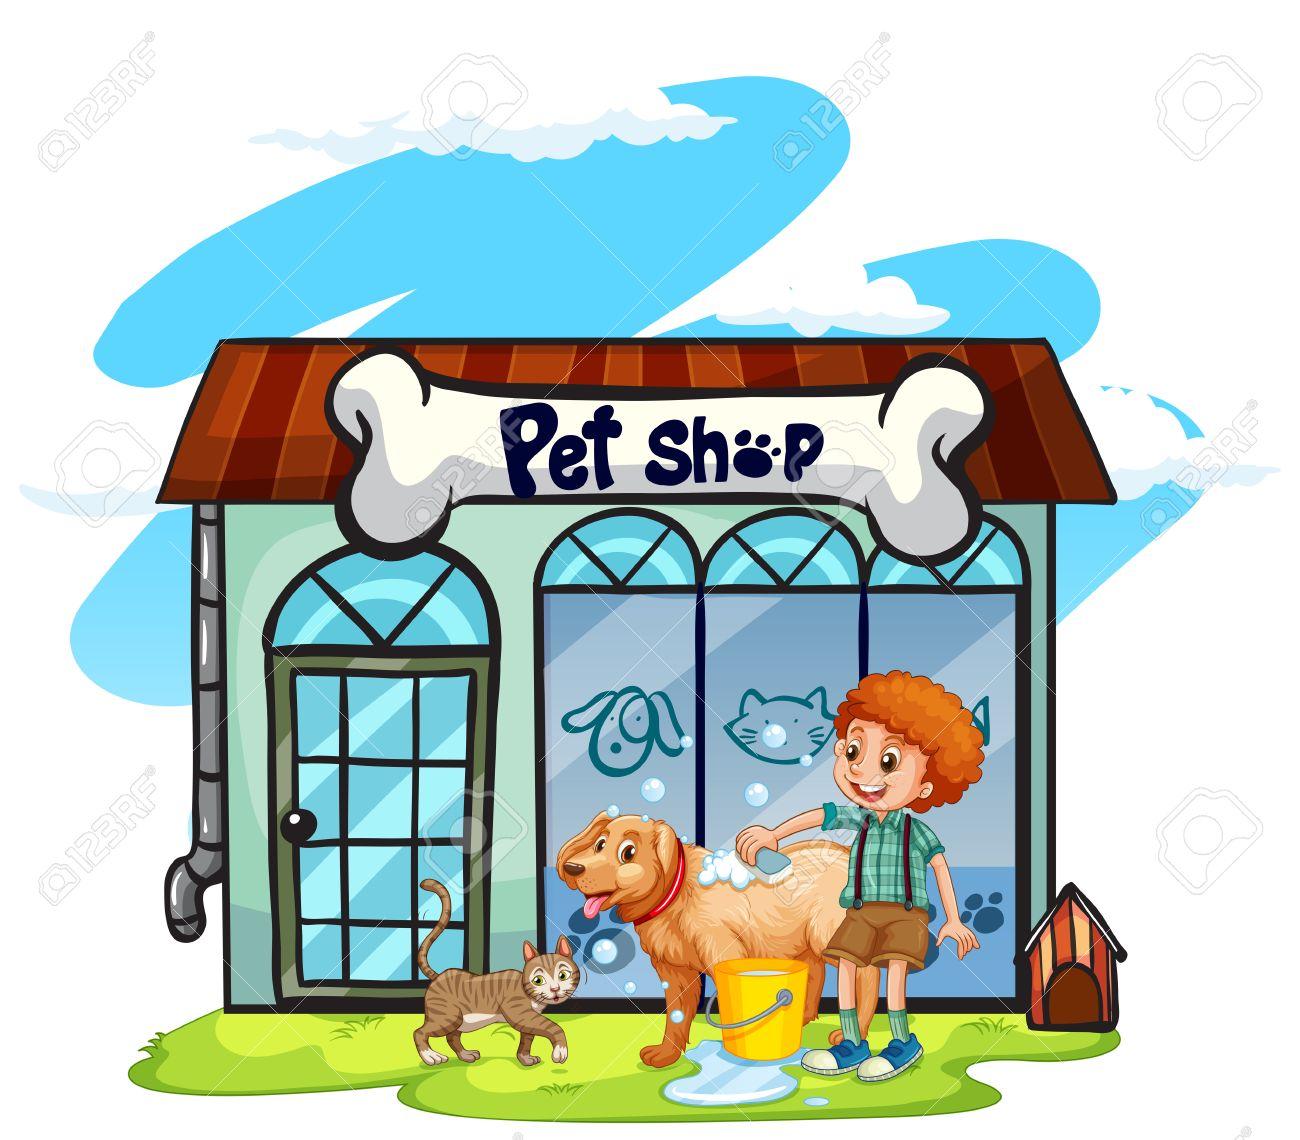 Boy washing dog at pet shop illustration.